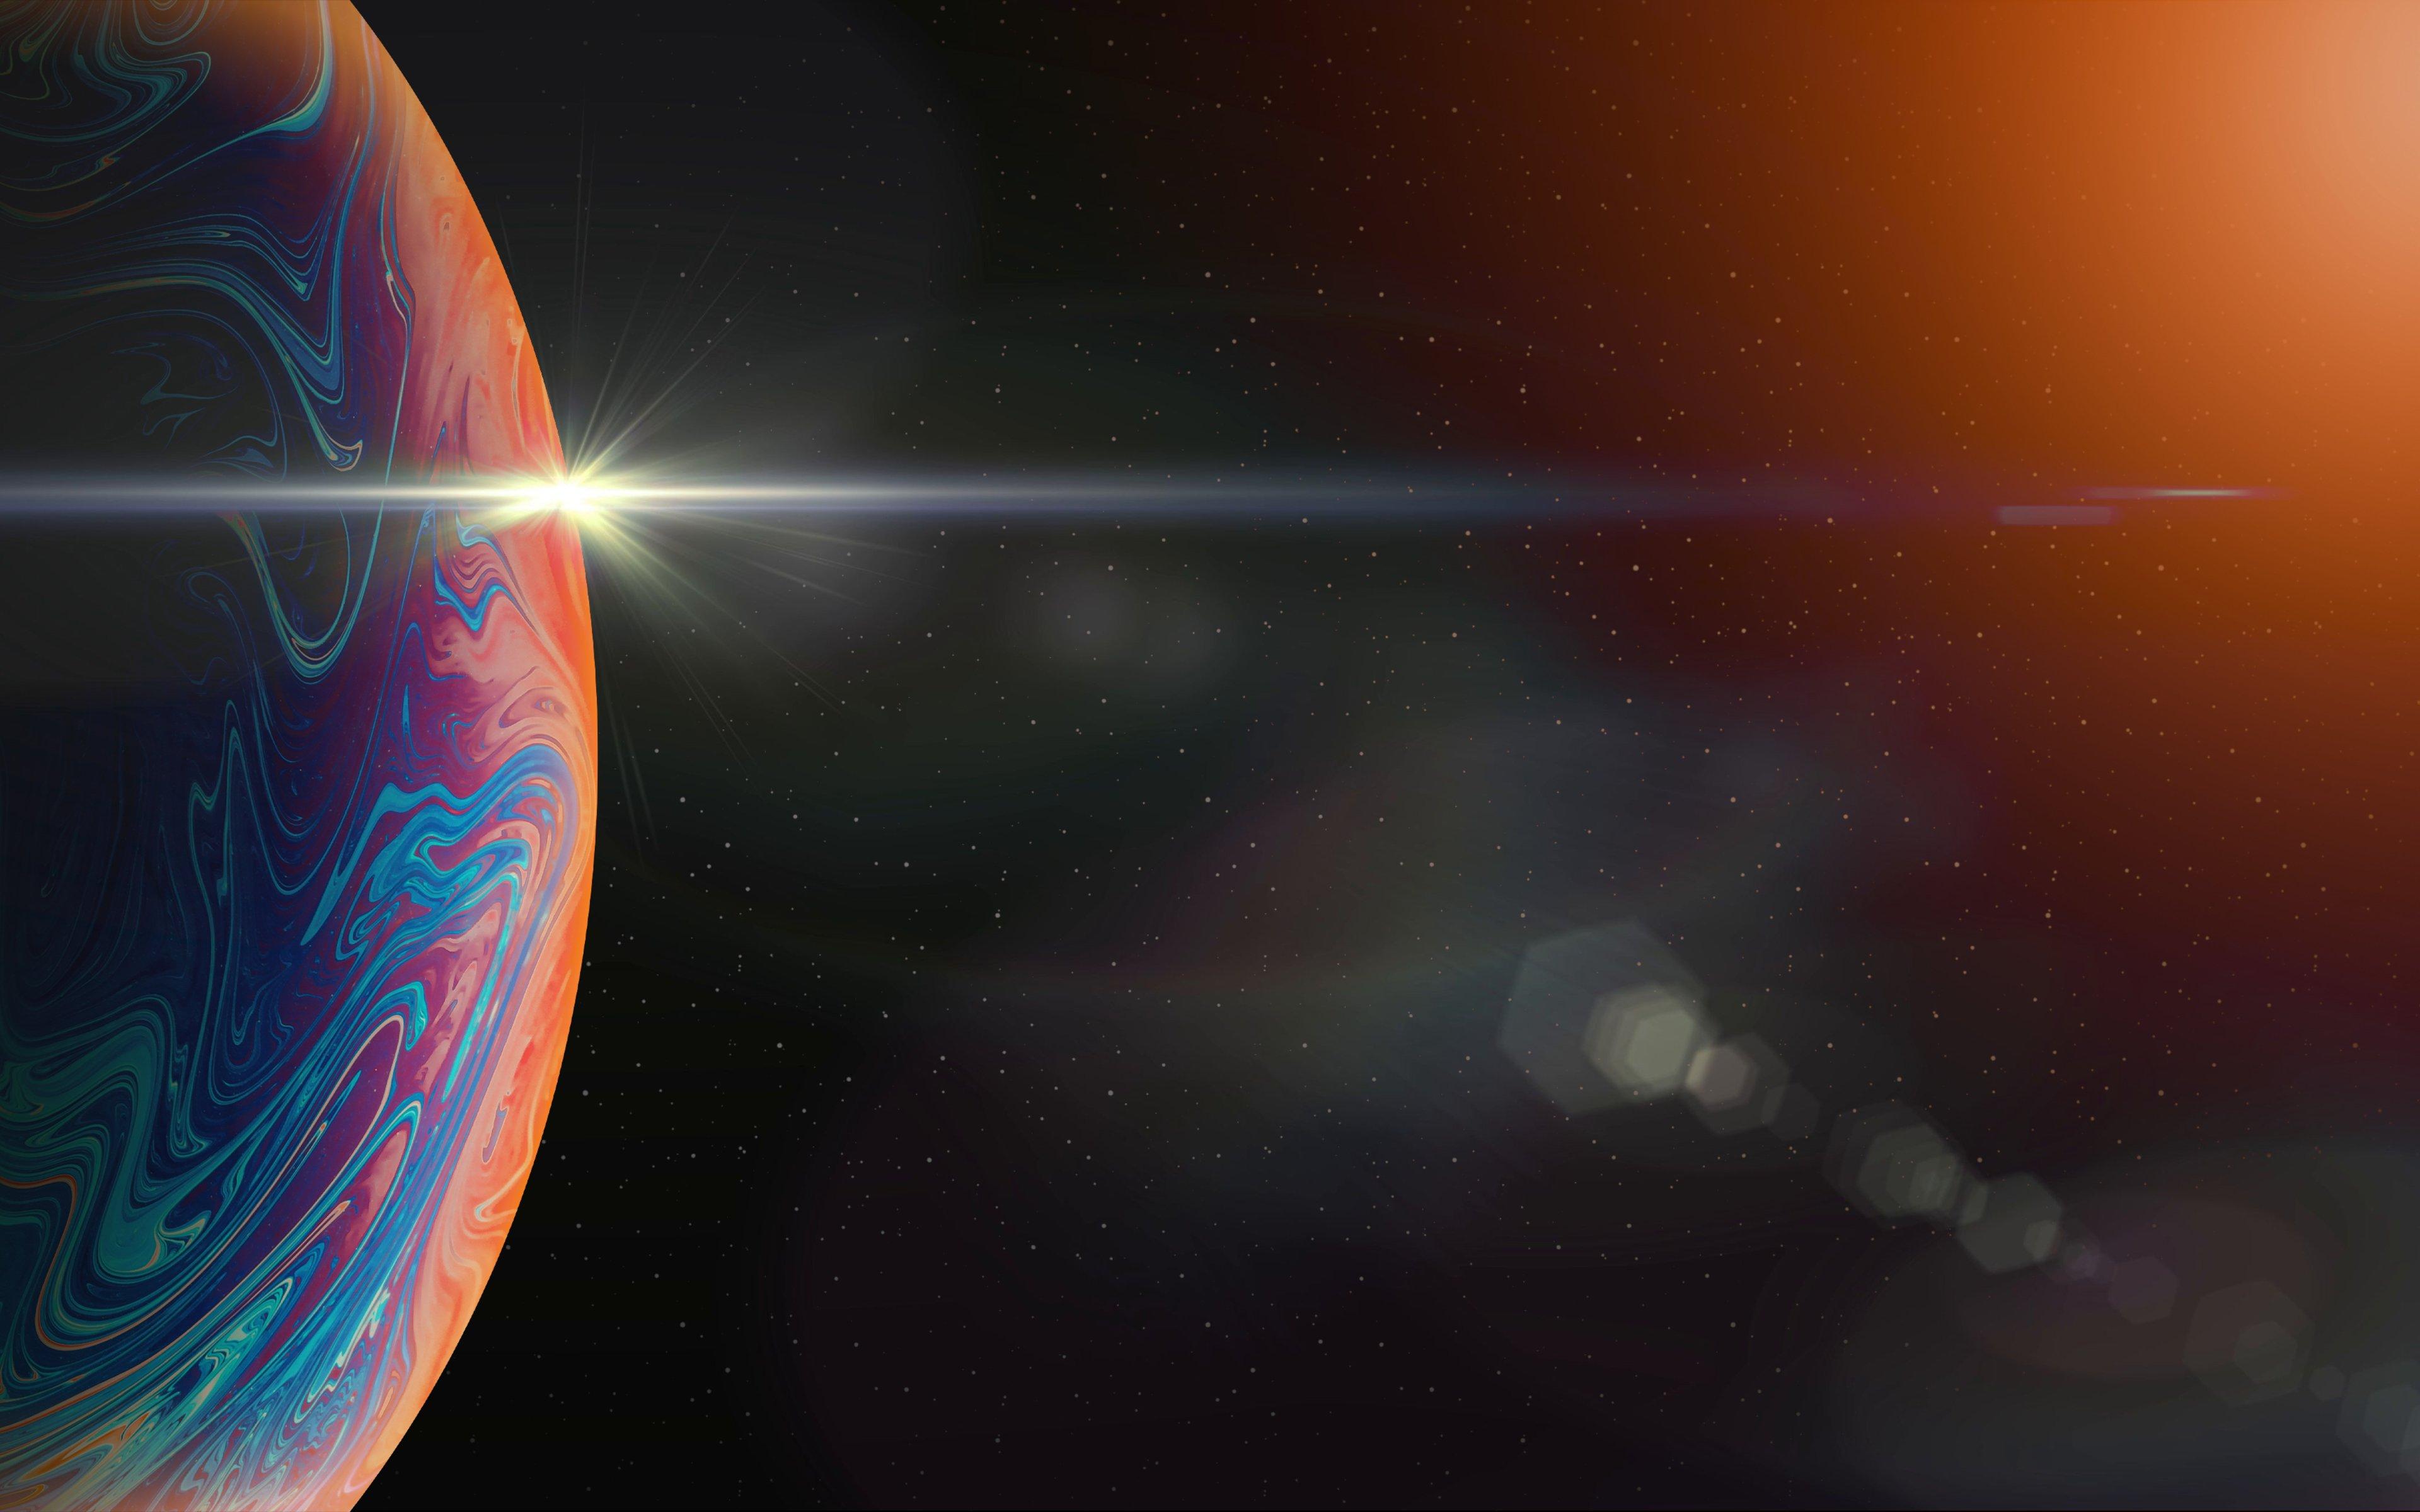 Fondos de pantalla Planeta de colores a la luz del sol